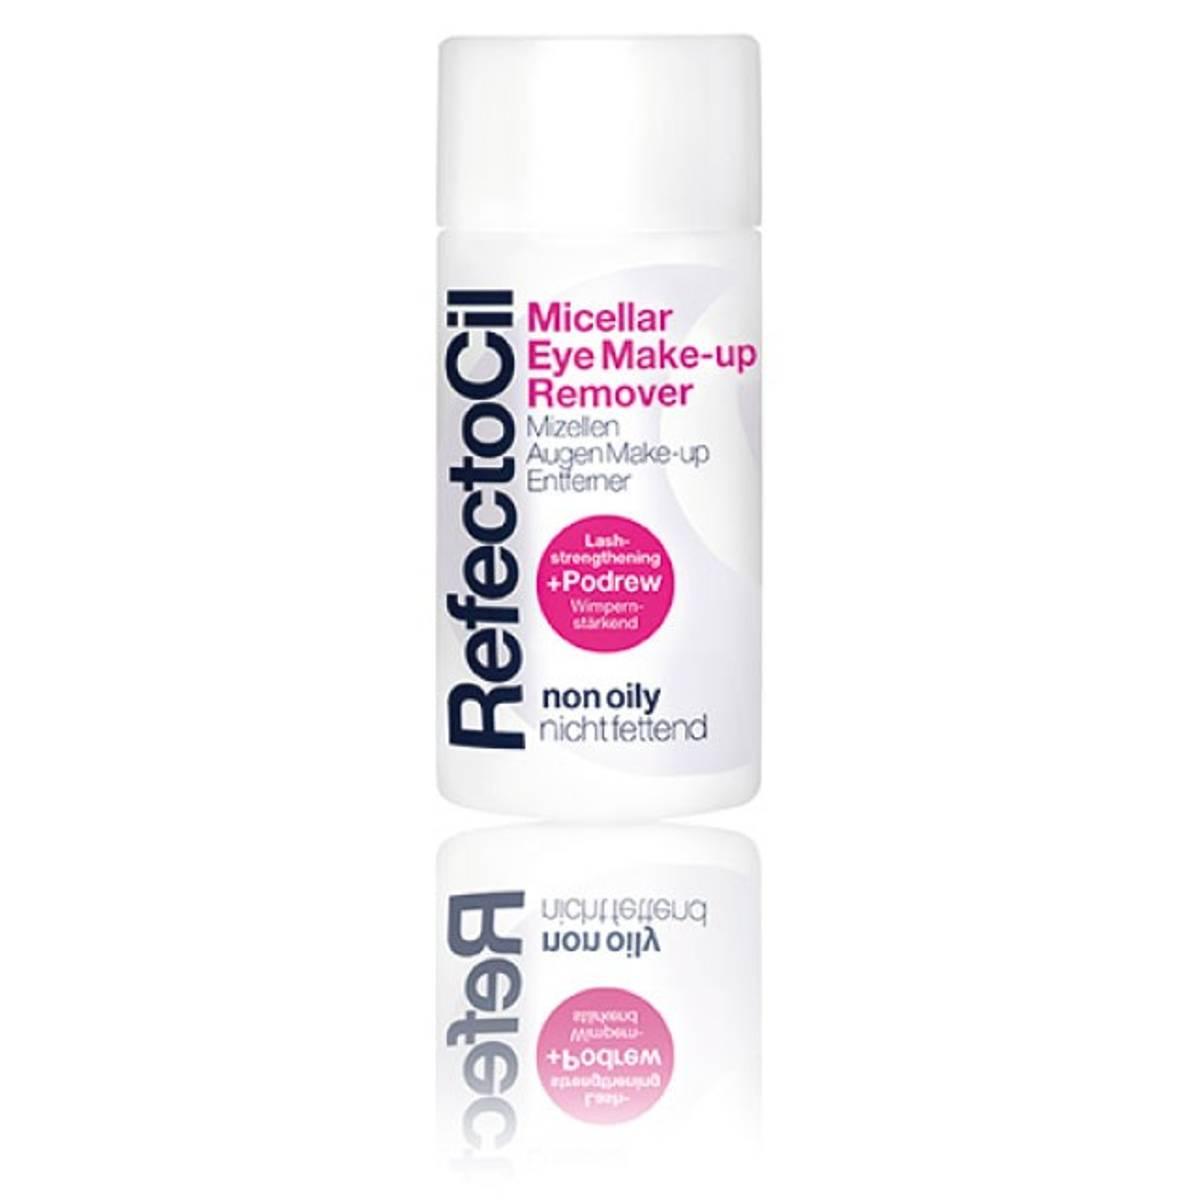 RefectoCil Eye Make-up Remover 150 ml